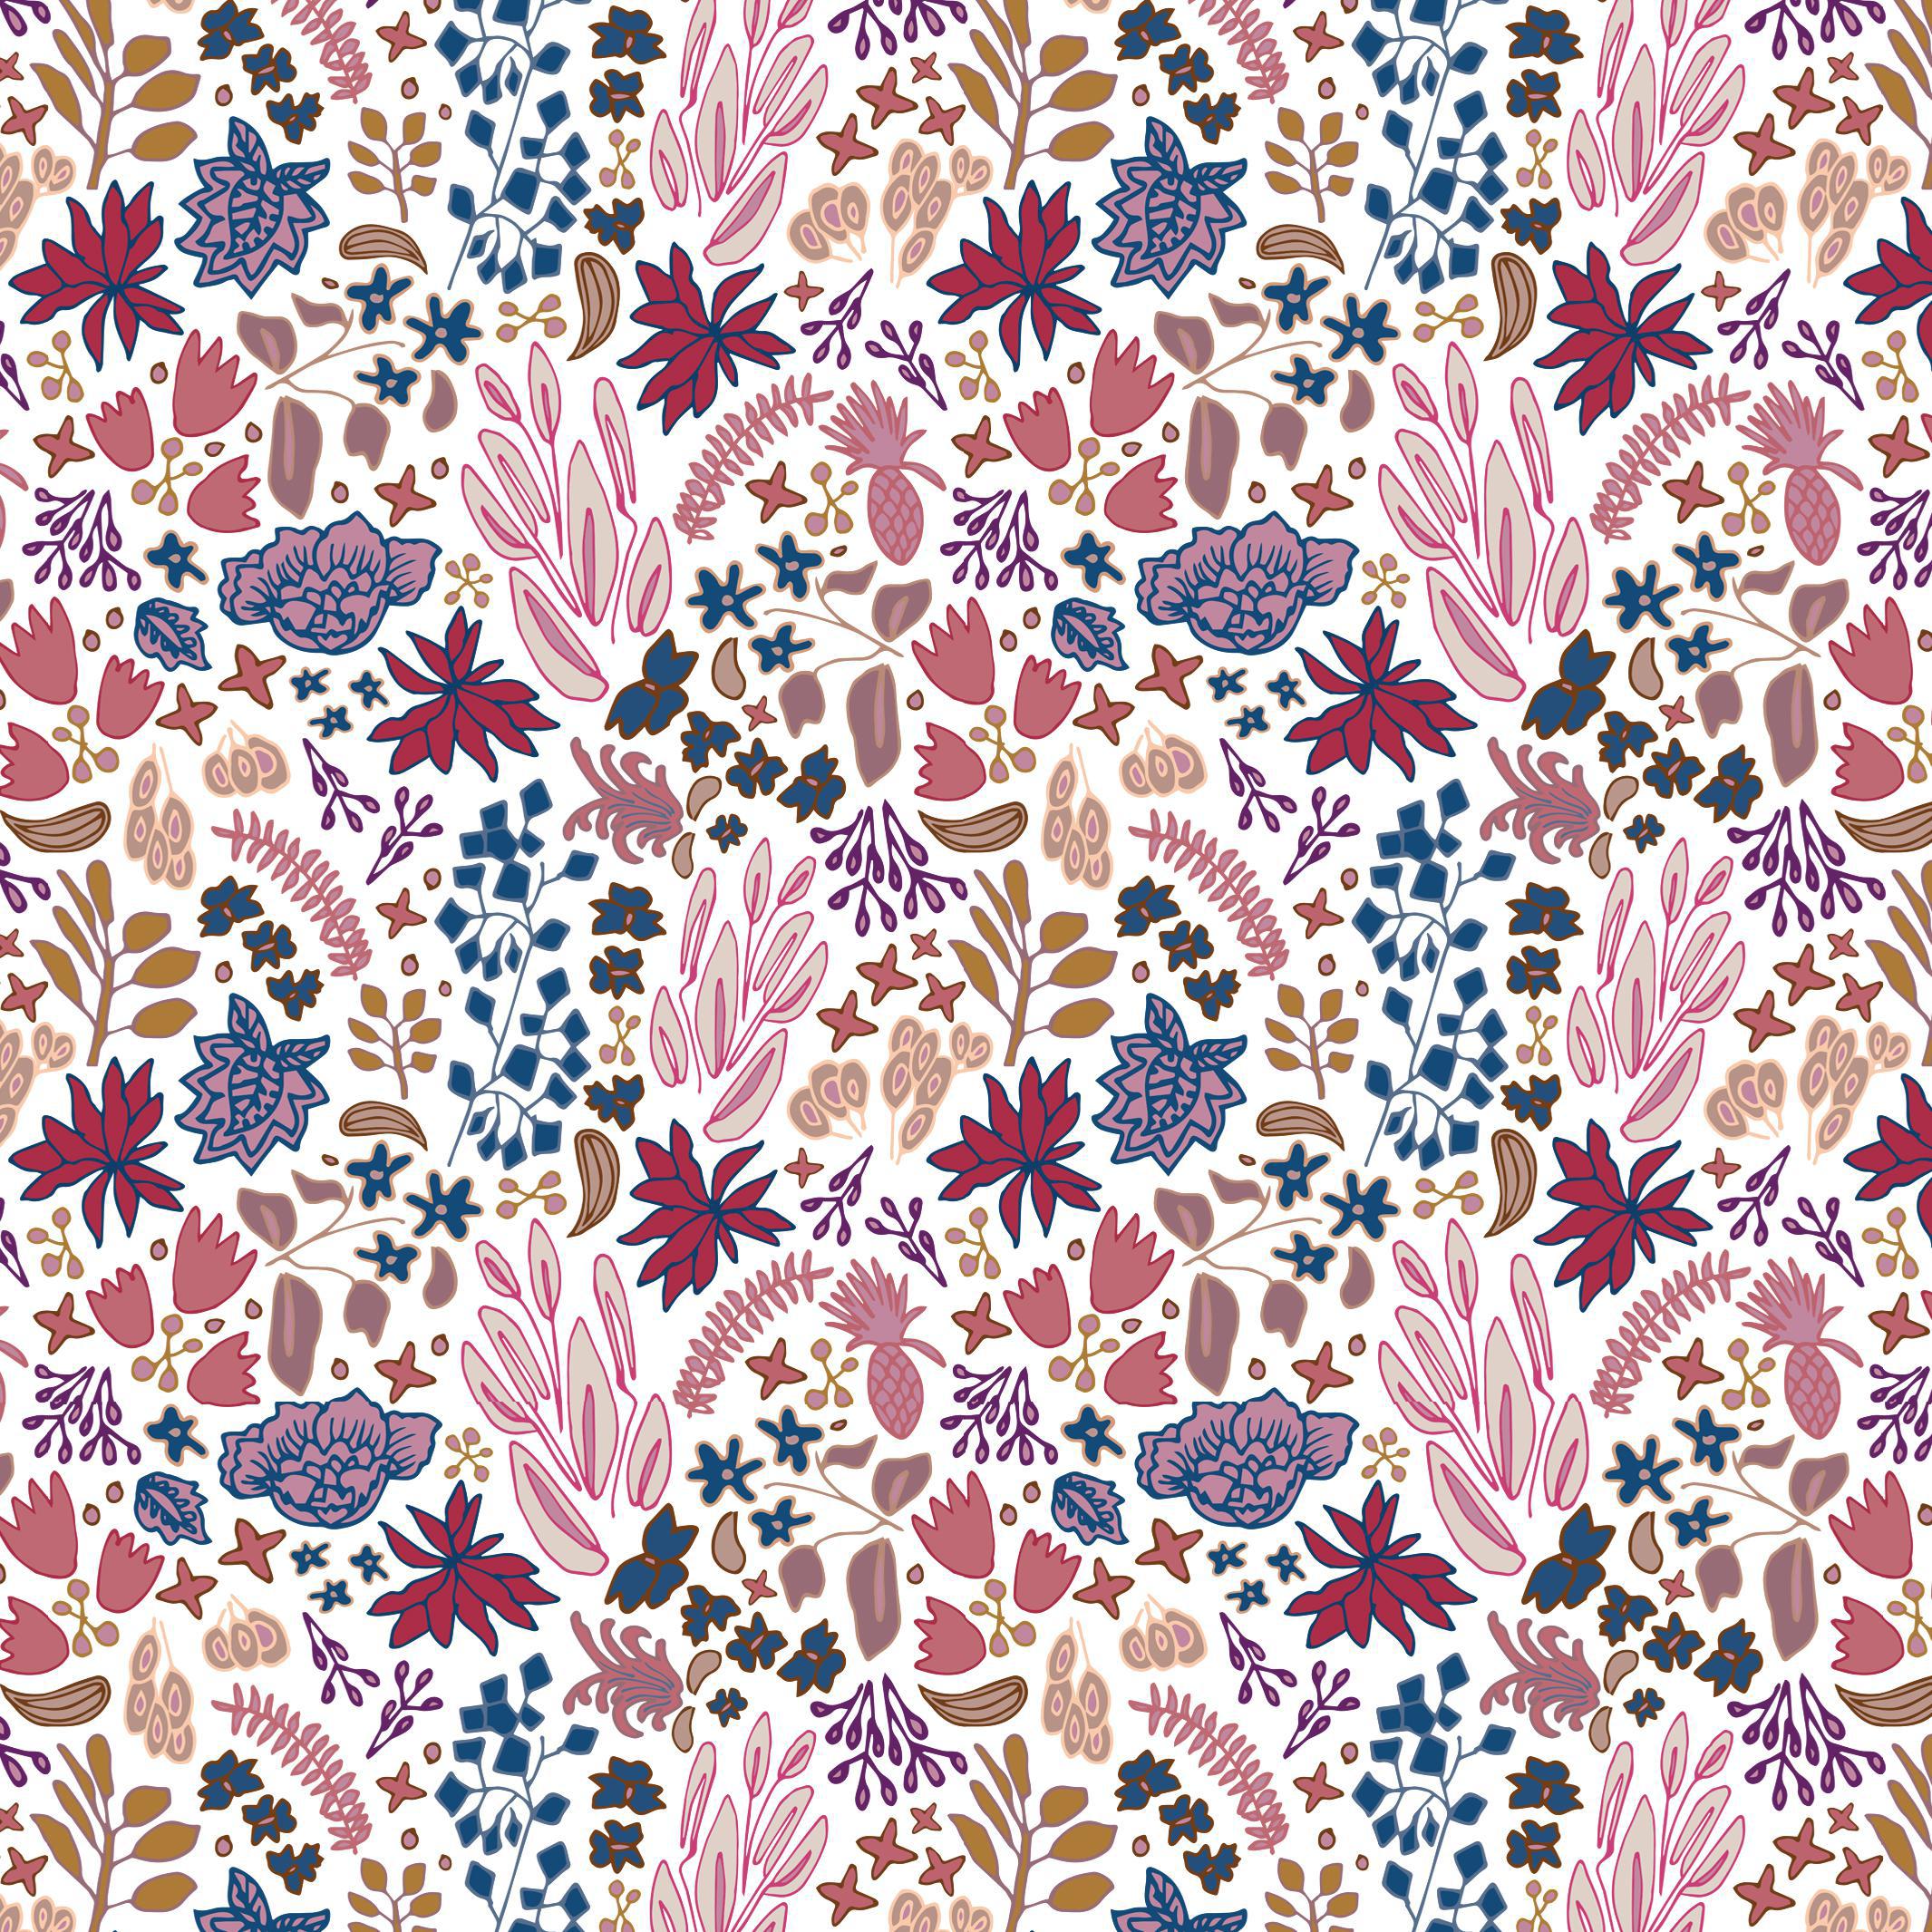 House Of Harris Cambridge Wallpaper Sample Chairish